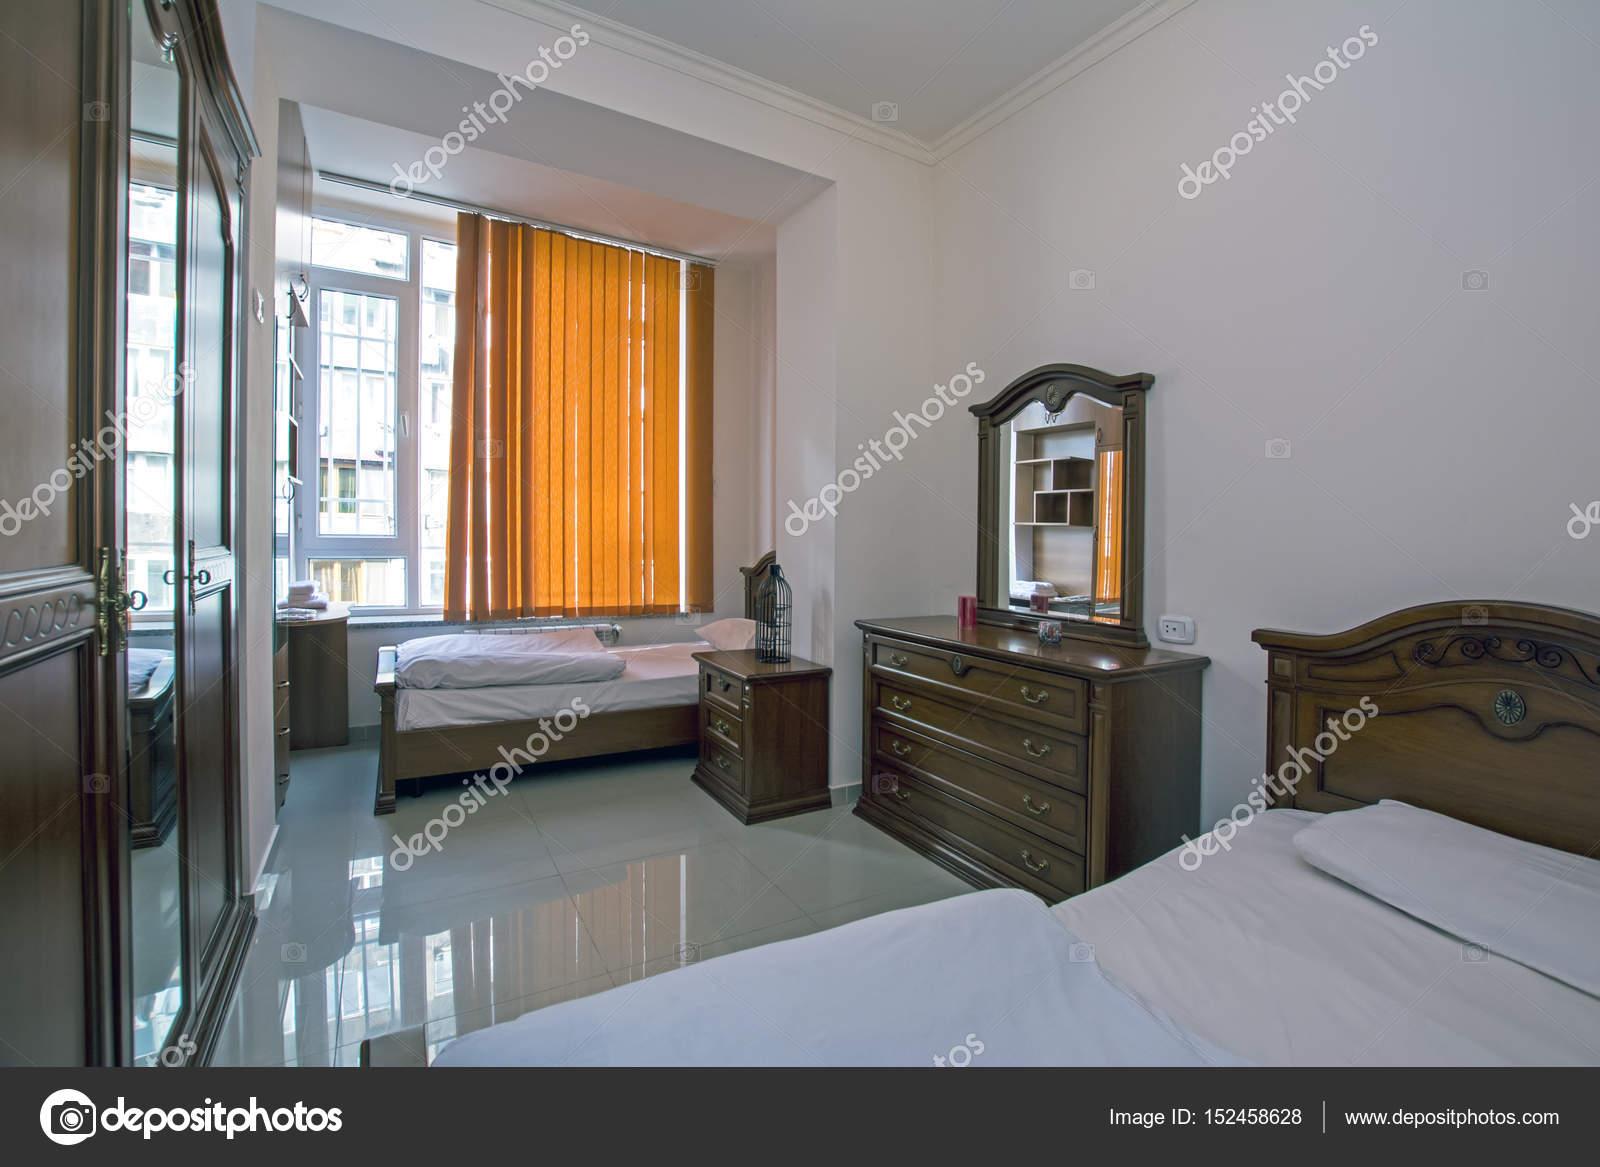 Yerevan armenia 16 aprile 2017: un moderno appartamento camera da